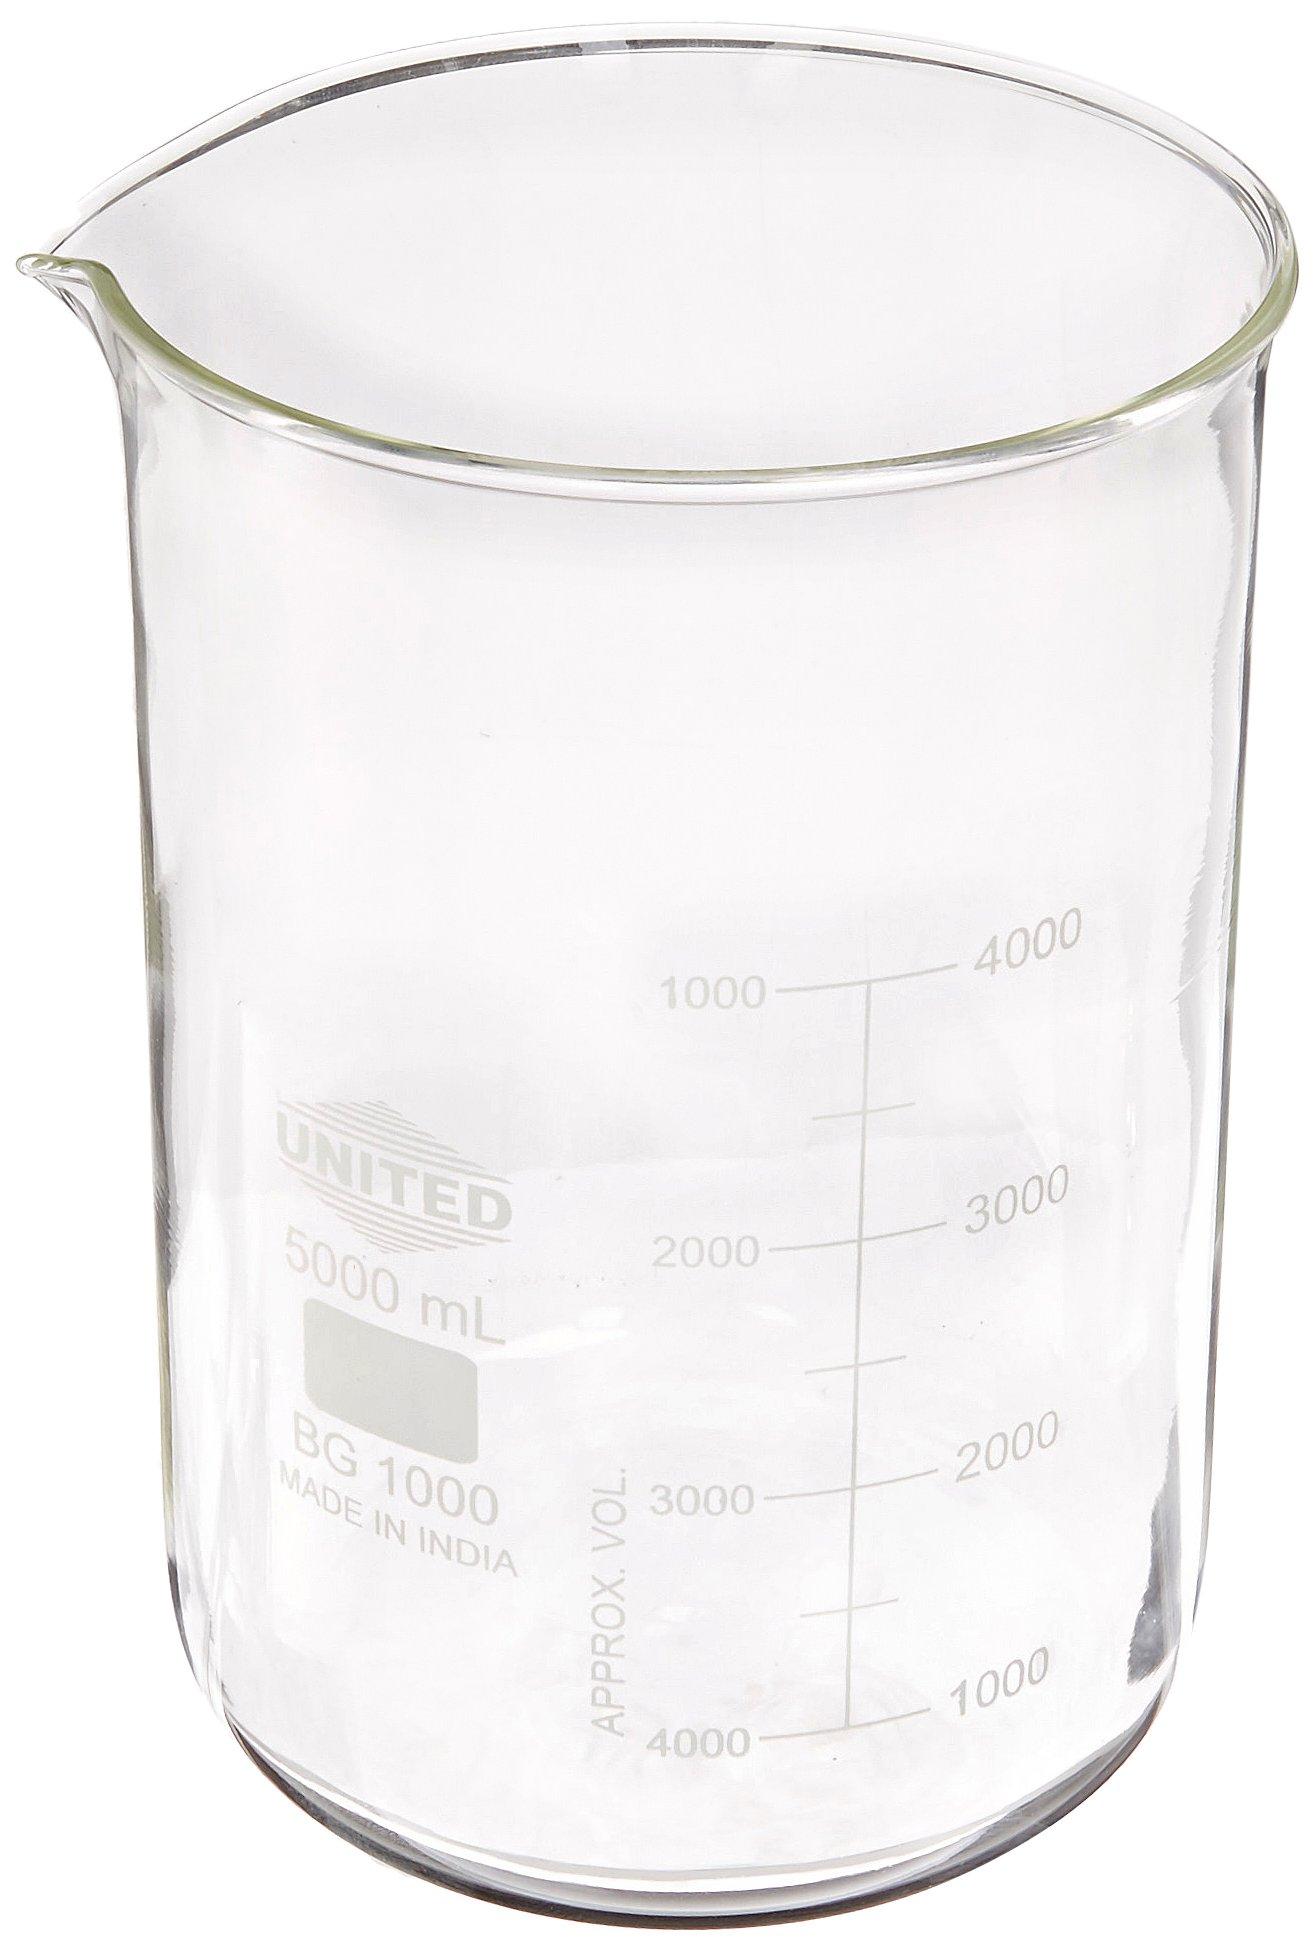 United Scientific BG1000-5000 Borosilicate Glass Low Form Beaker, 5000ml Capacity by United Scientific Supplies (Image #1)